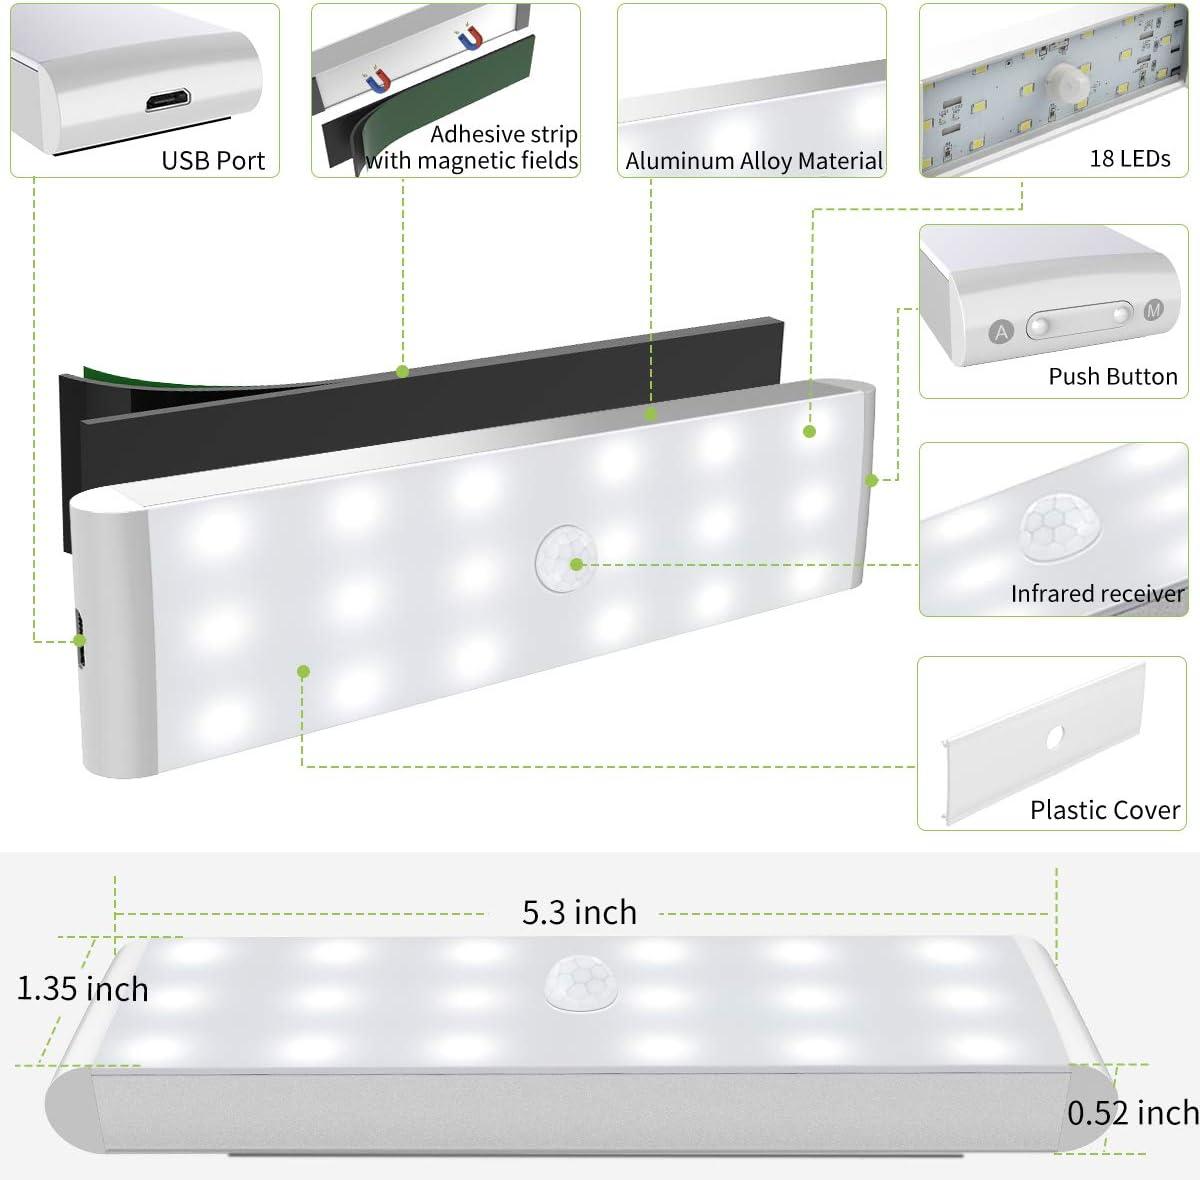 LED Closet Light 18-LED Motion Sensor Dimmer Under Cabinet Light Rechargeable Wireless Stick on Anywhere Night Light Bar Safe Lights for Wardrobe Stairs Bedroom Hallway 1 Pack